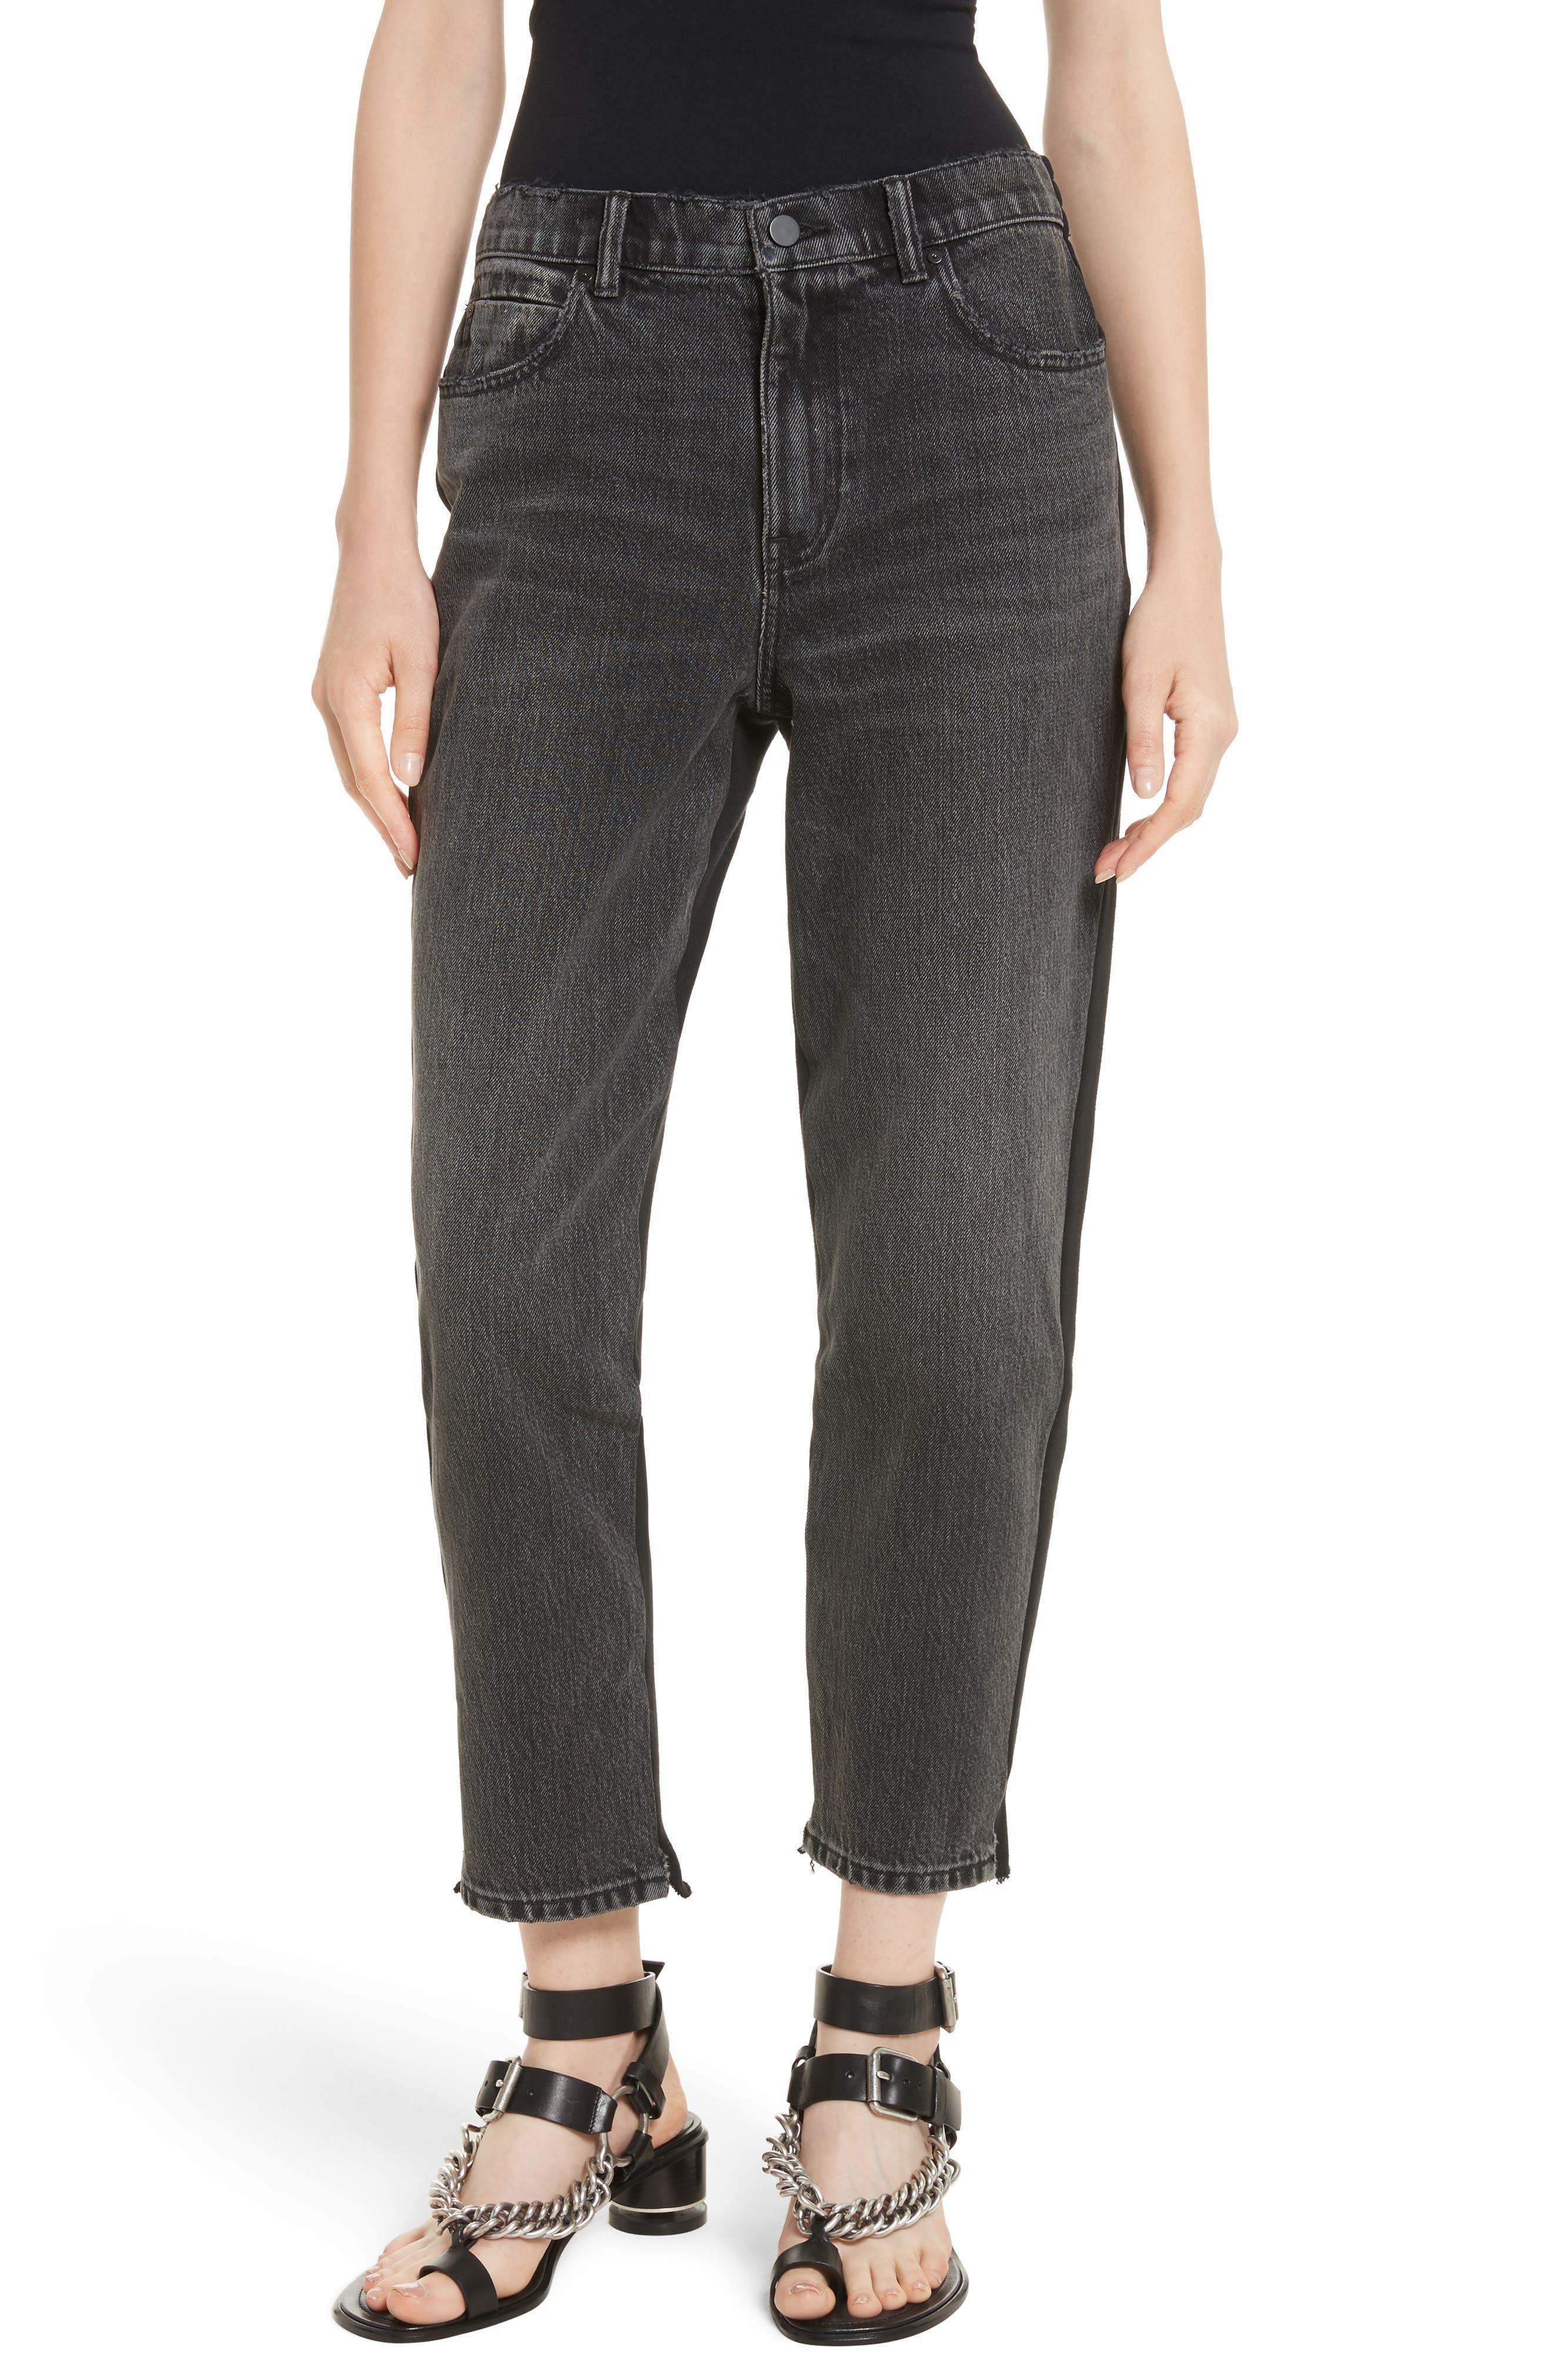 Denim x Alexander Wang Hybrid Sweatpants Jeans,                             Main thumbnail 1, color,                             025